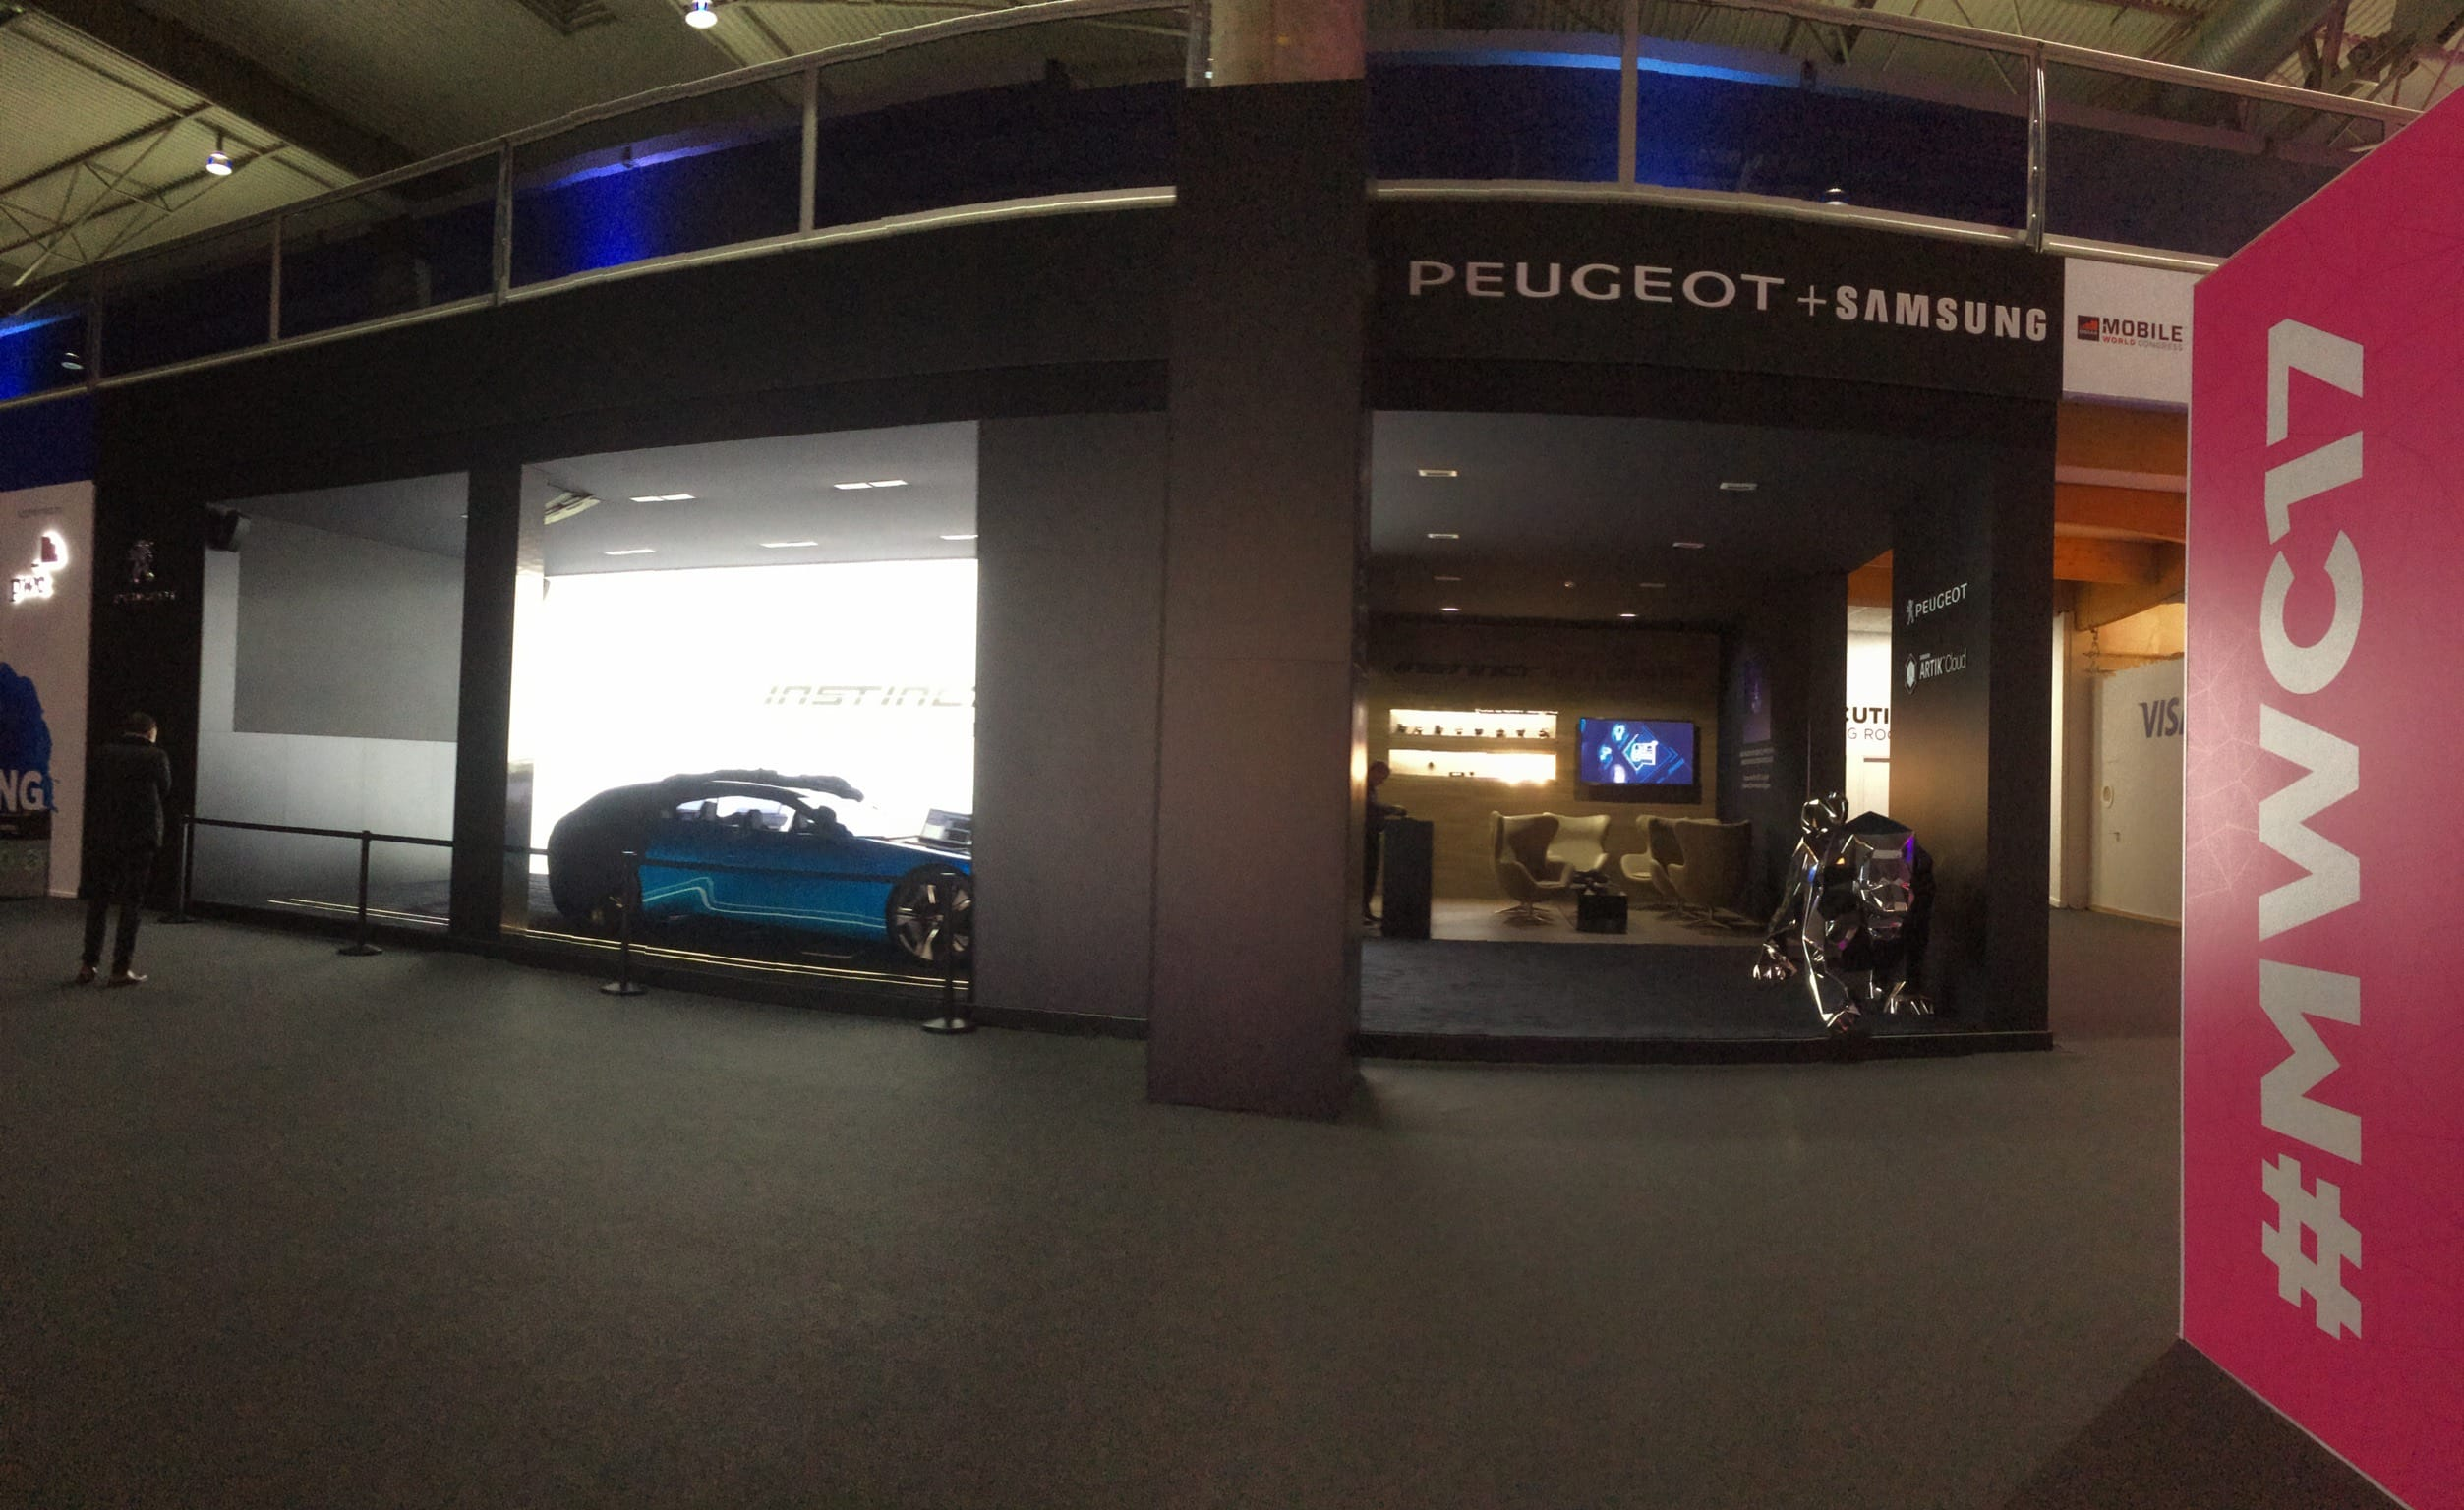 Peugeot_samsung